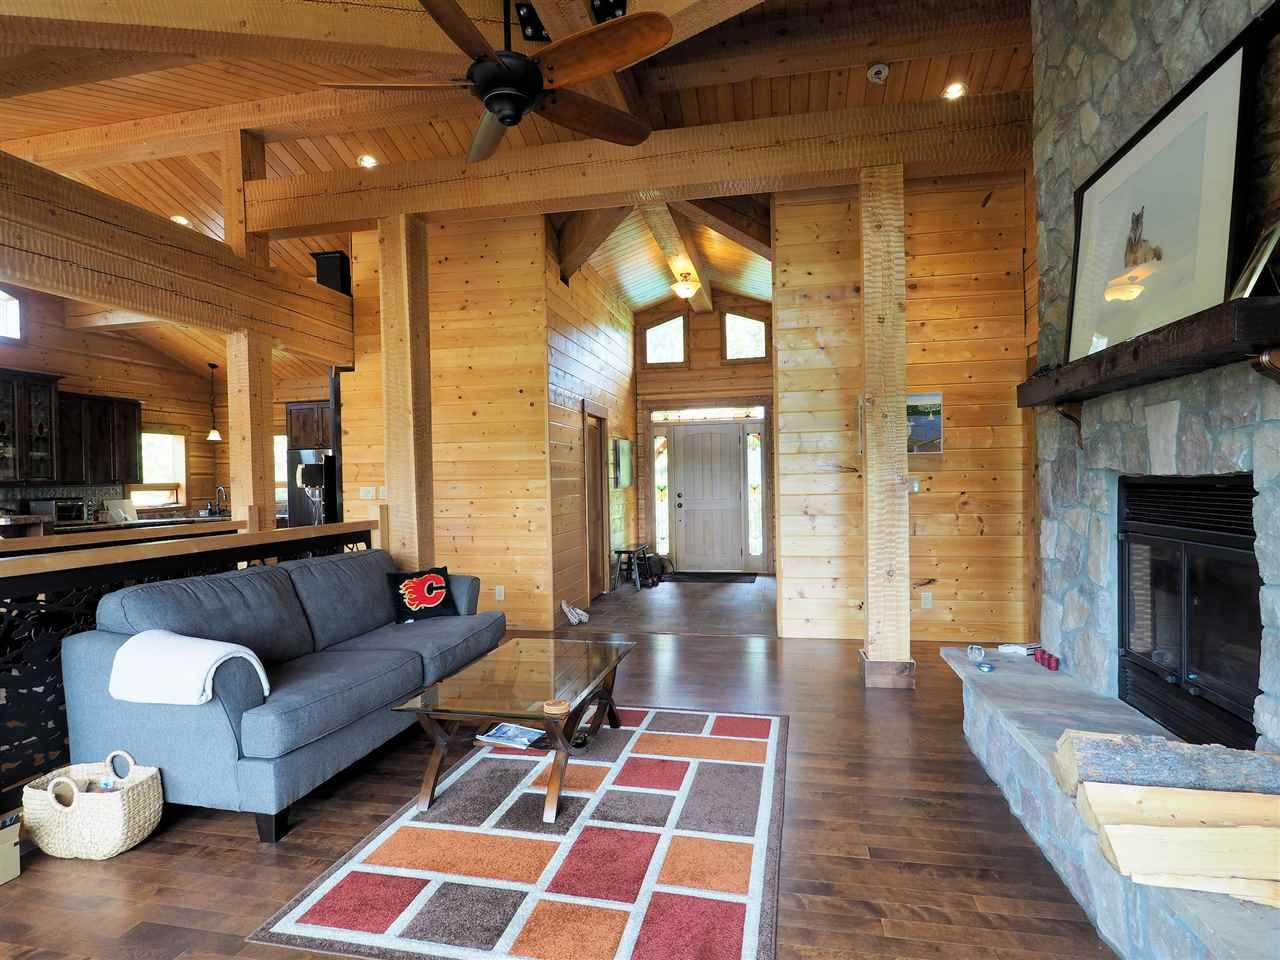 Photo 6: Photos: 4050 CANIM-HENDRIX LAKE Road in Canim Lake: Canim/Mahood Lake House for sale (100 Mile House (Zone 10))  : MLS®# R2396282